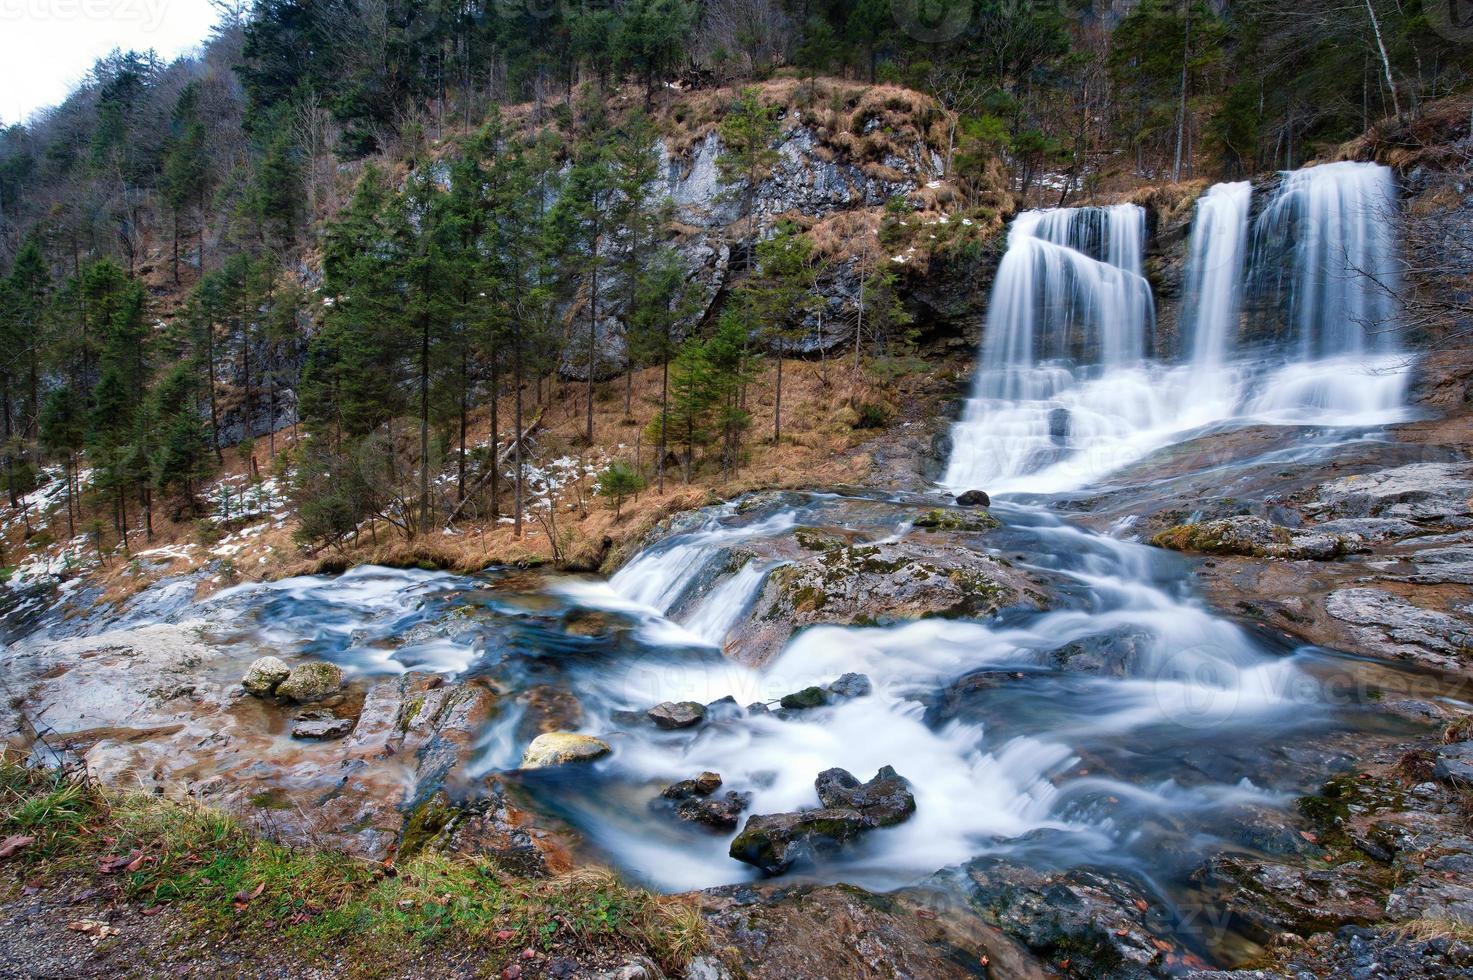 Waterfall in winter photo